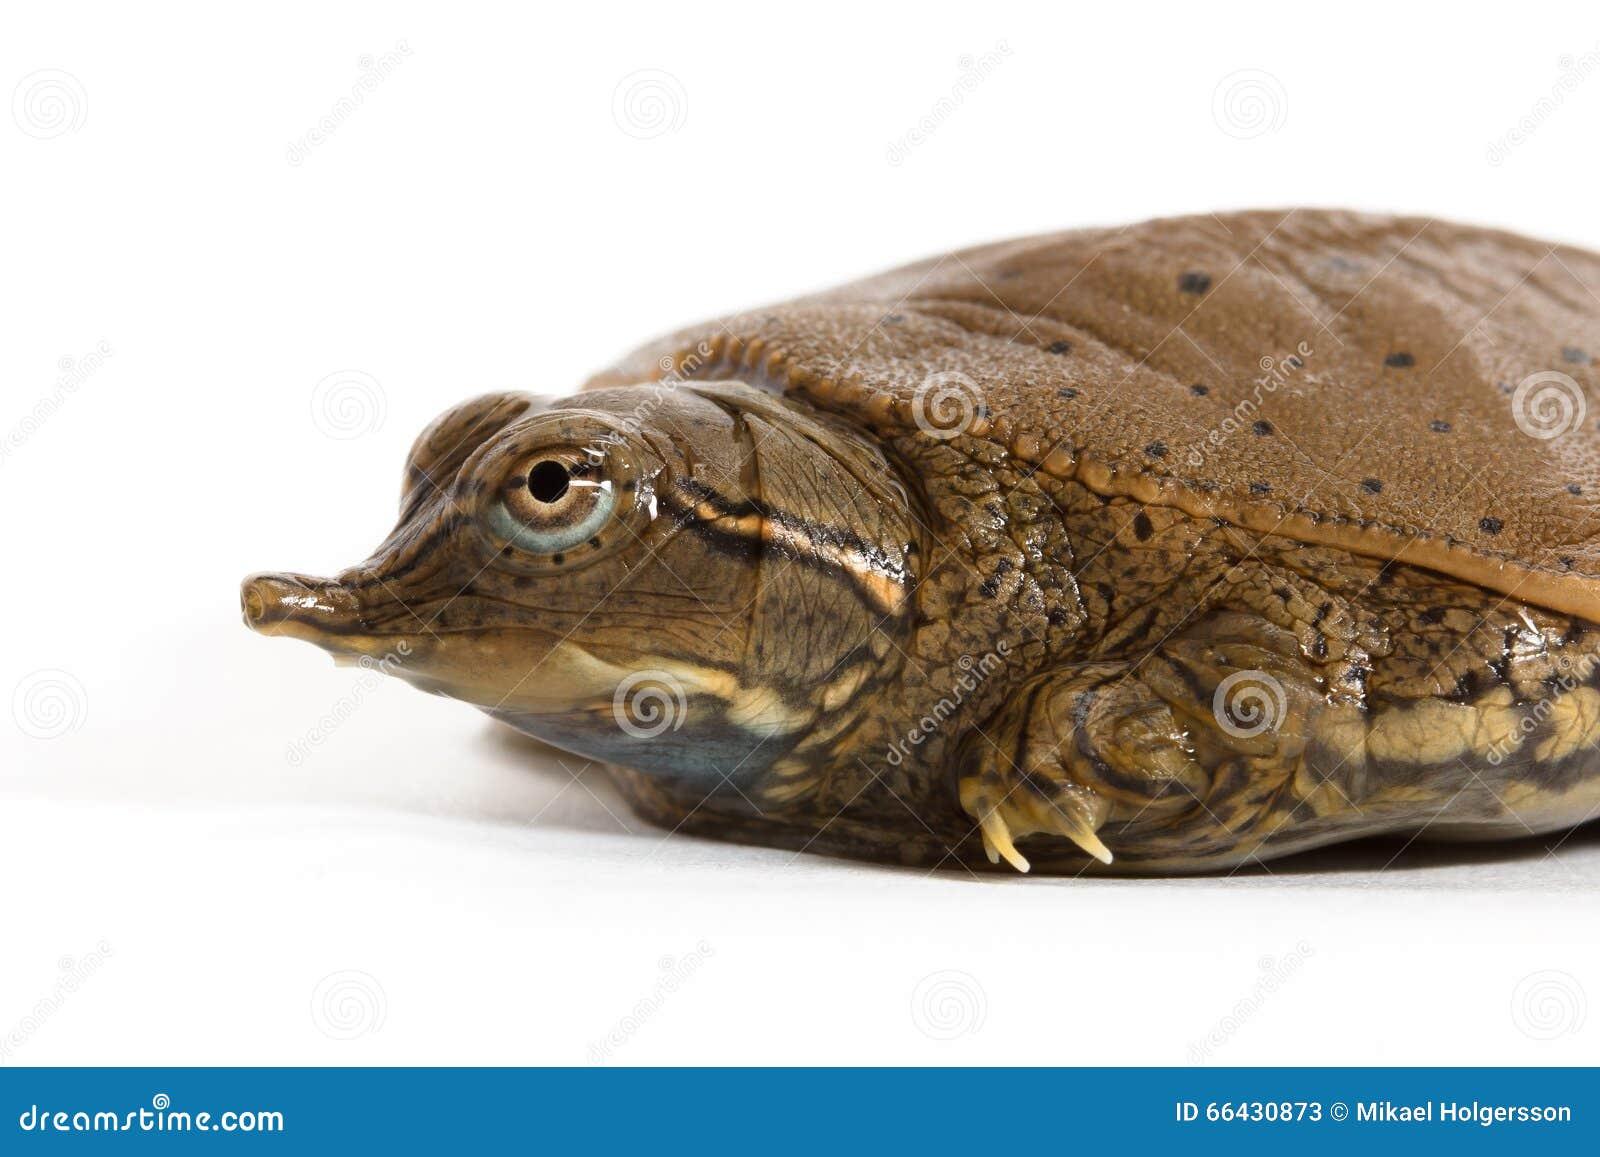 Hatchling Spiny Softshell Turtle - Left Profile